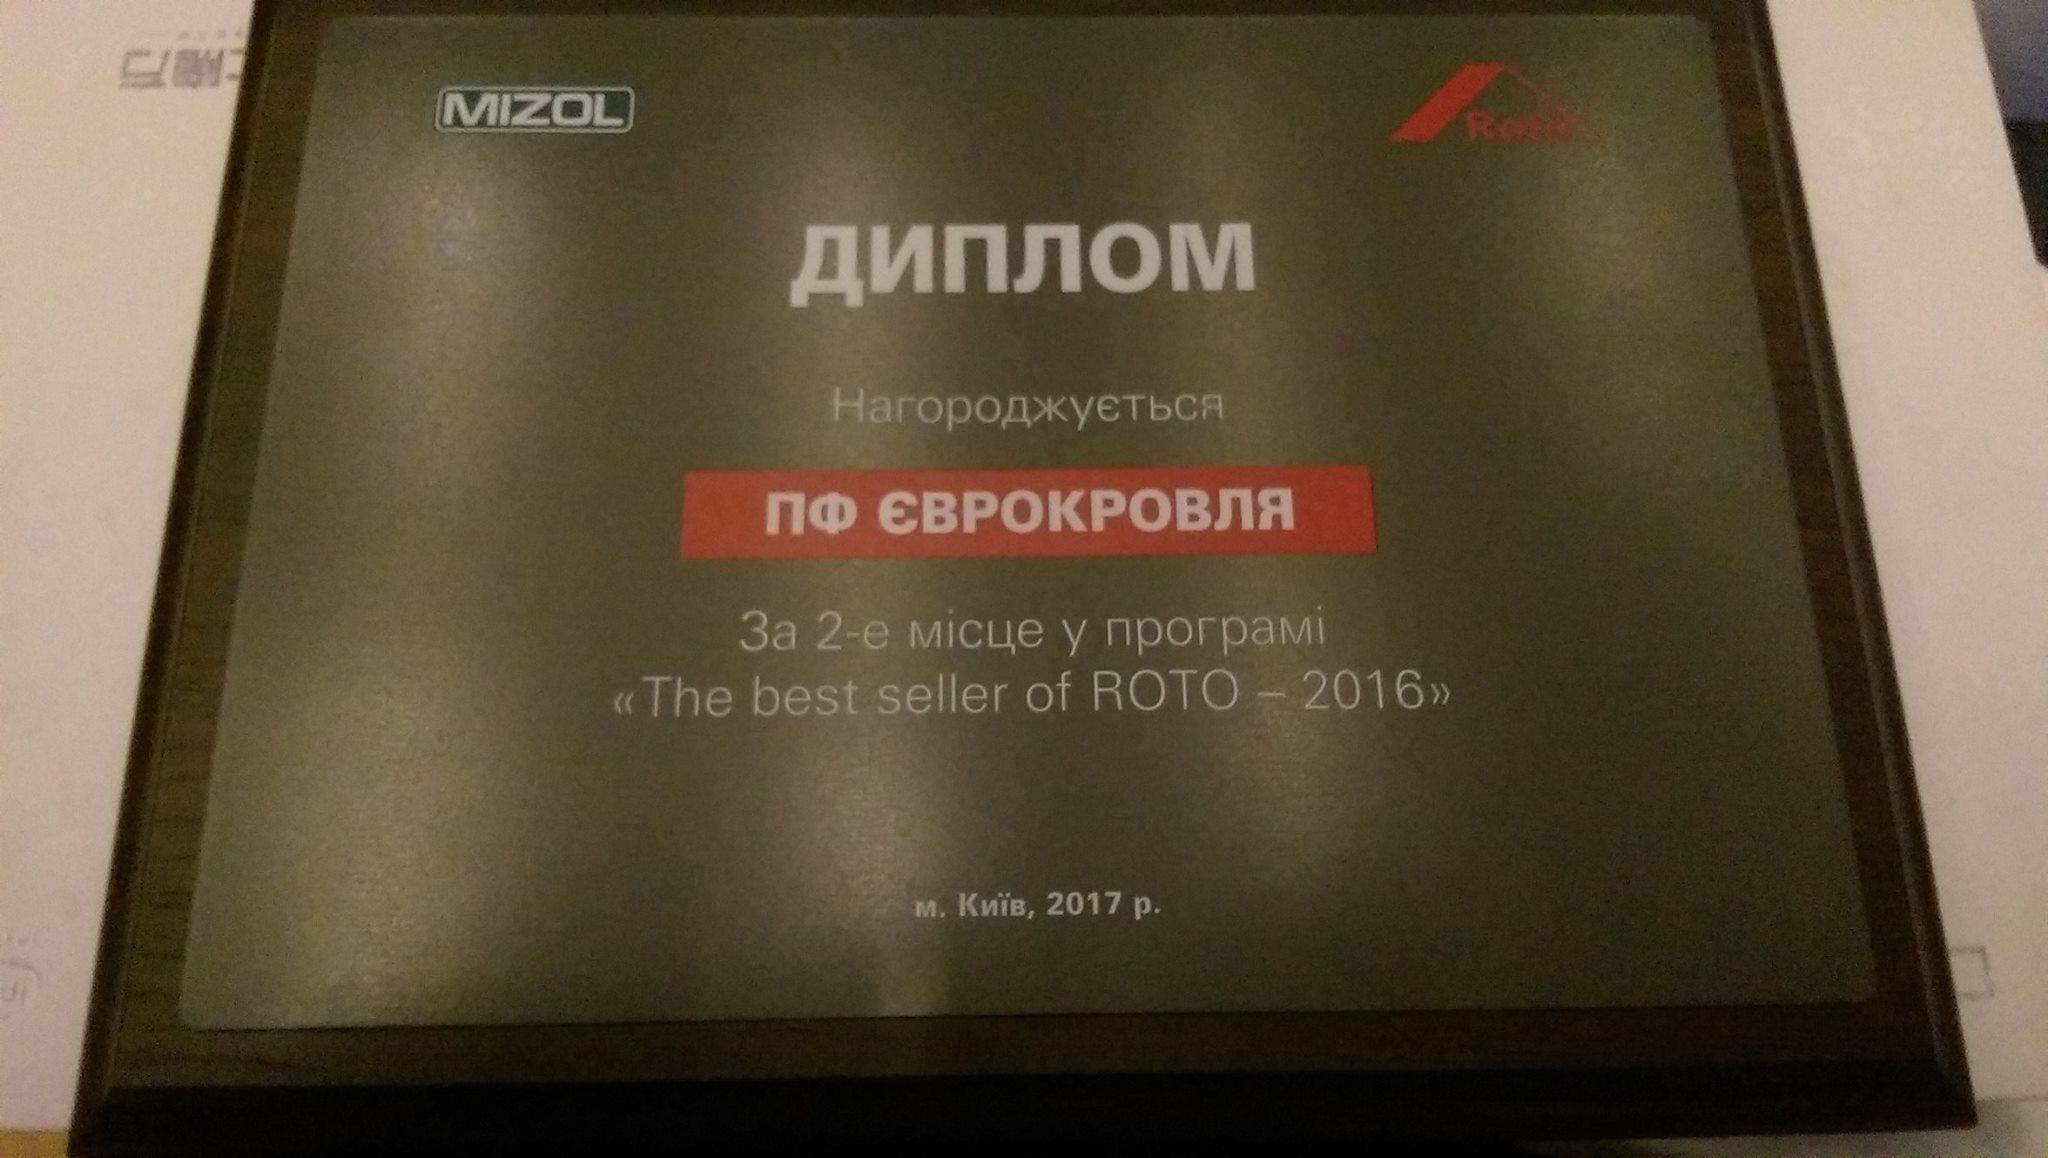 The best seller of Roto 2016 - EvroKrovlya